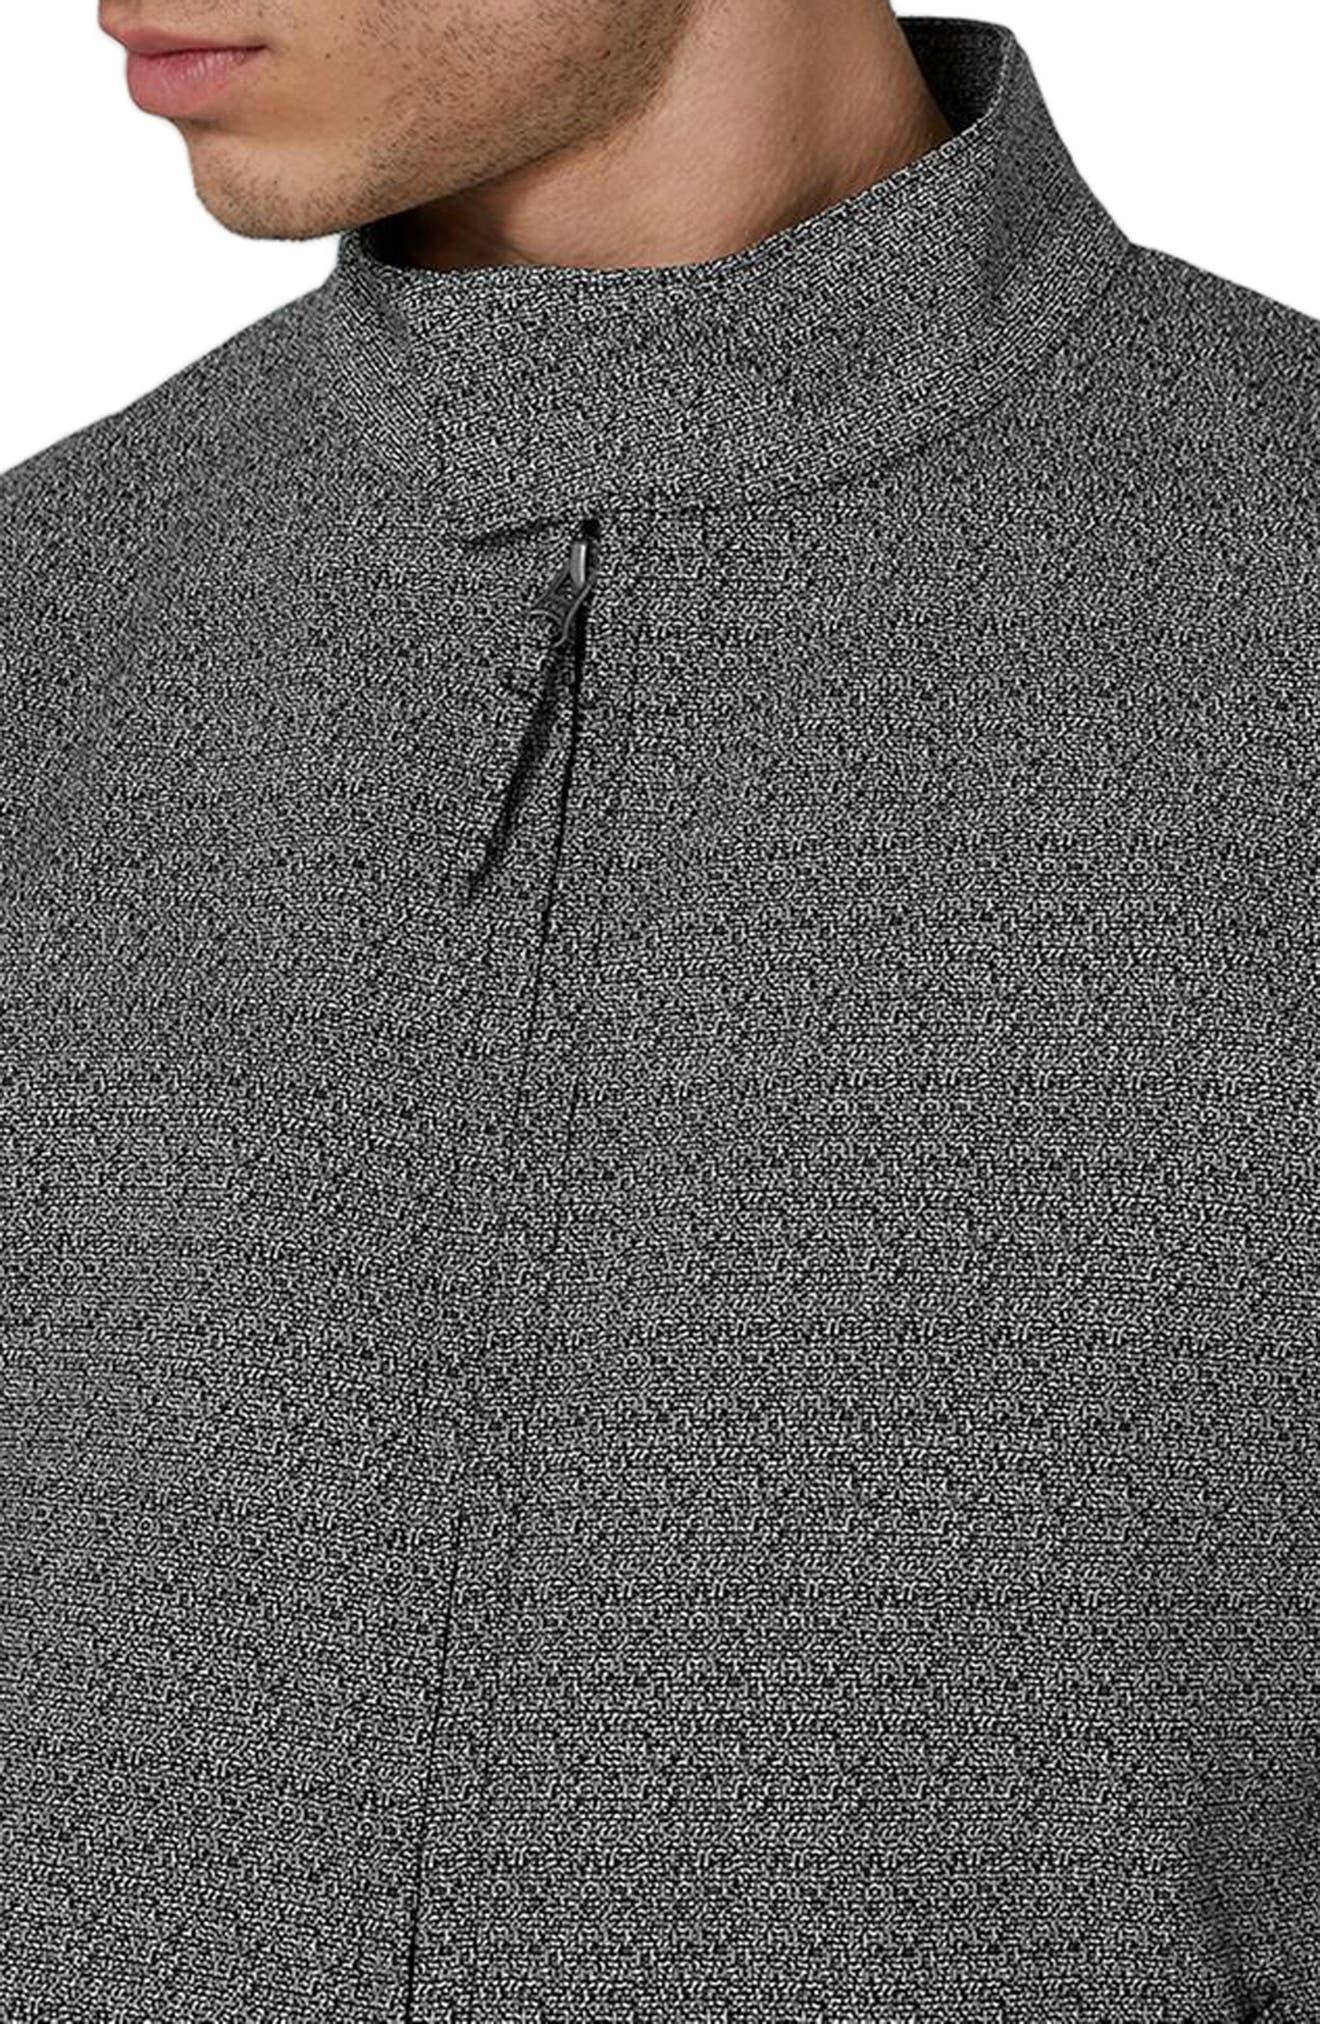 Alternate Image 3  - Topman Textured Harrington Jacket